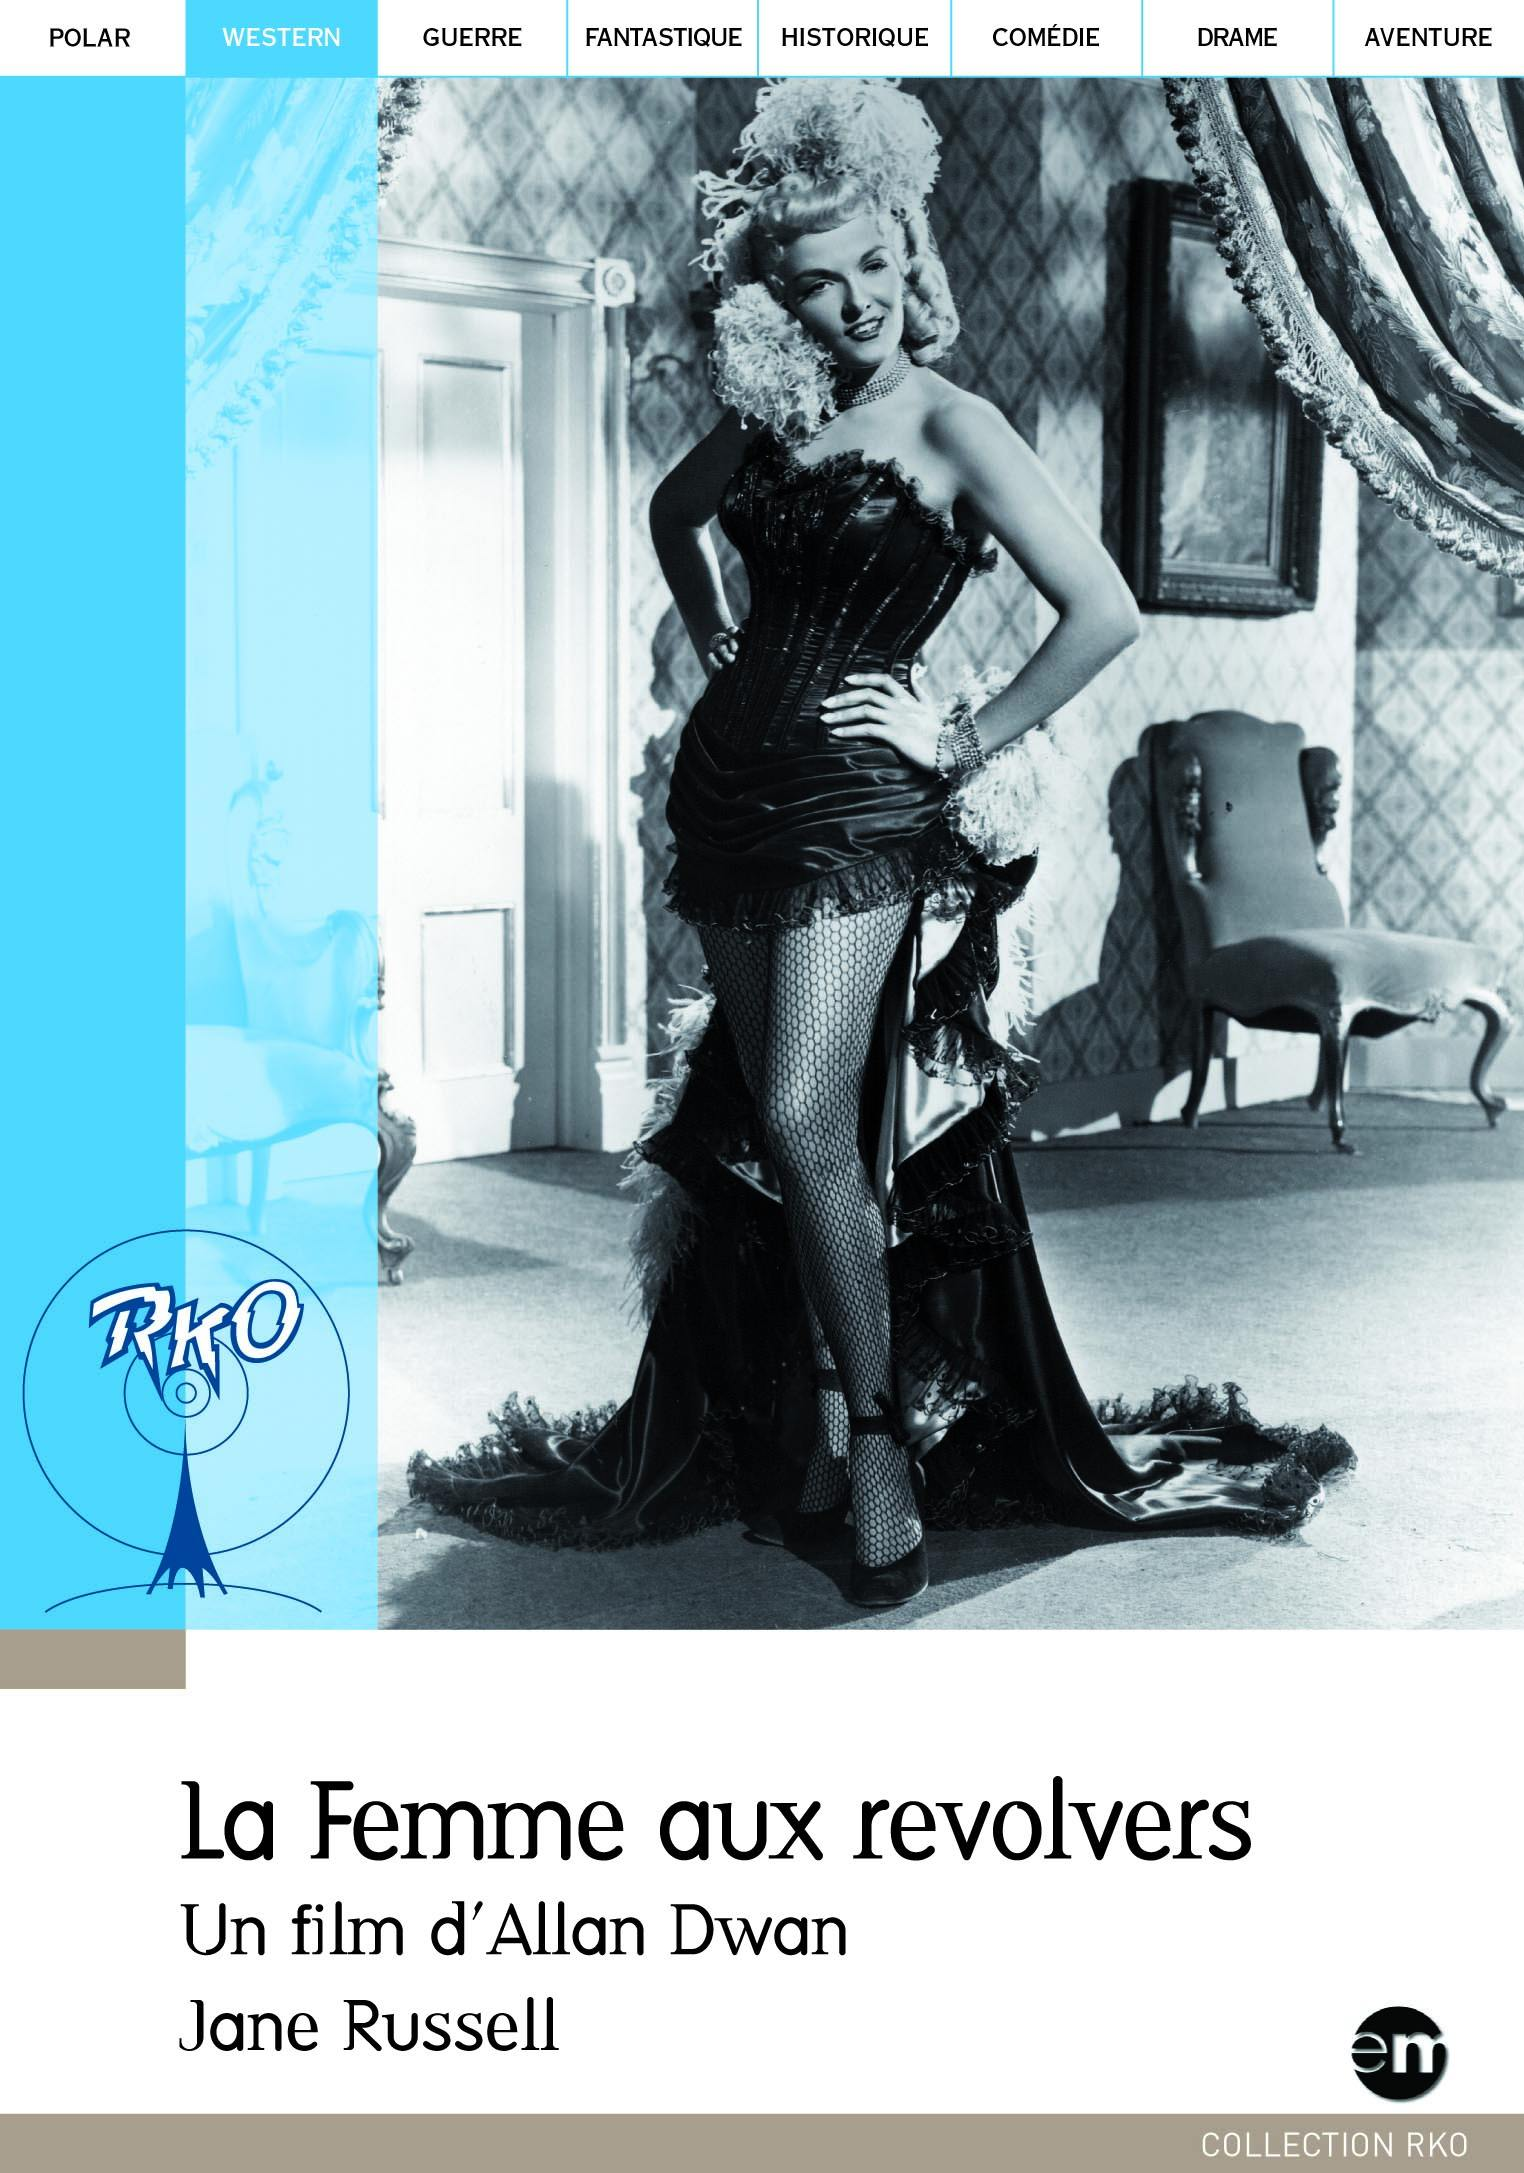 La femme aux revolvers - dvd  collection rko pocket